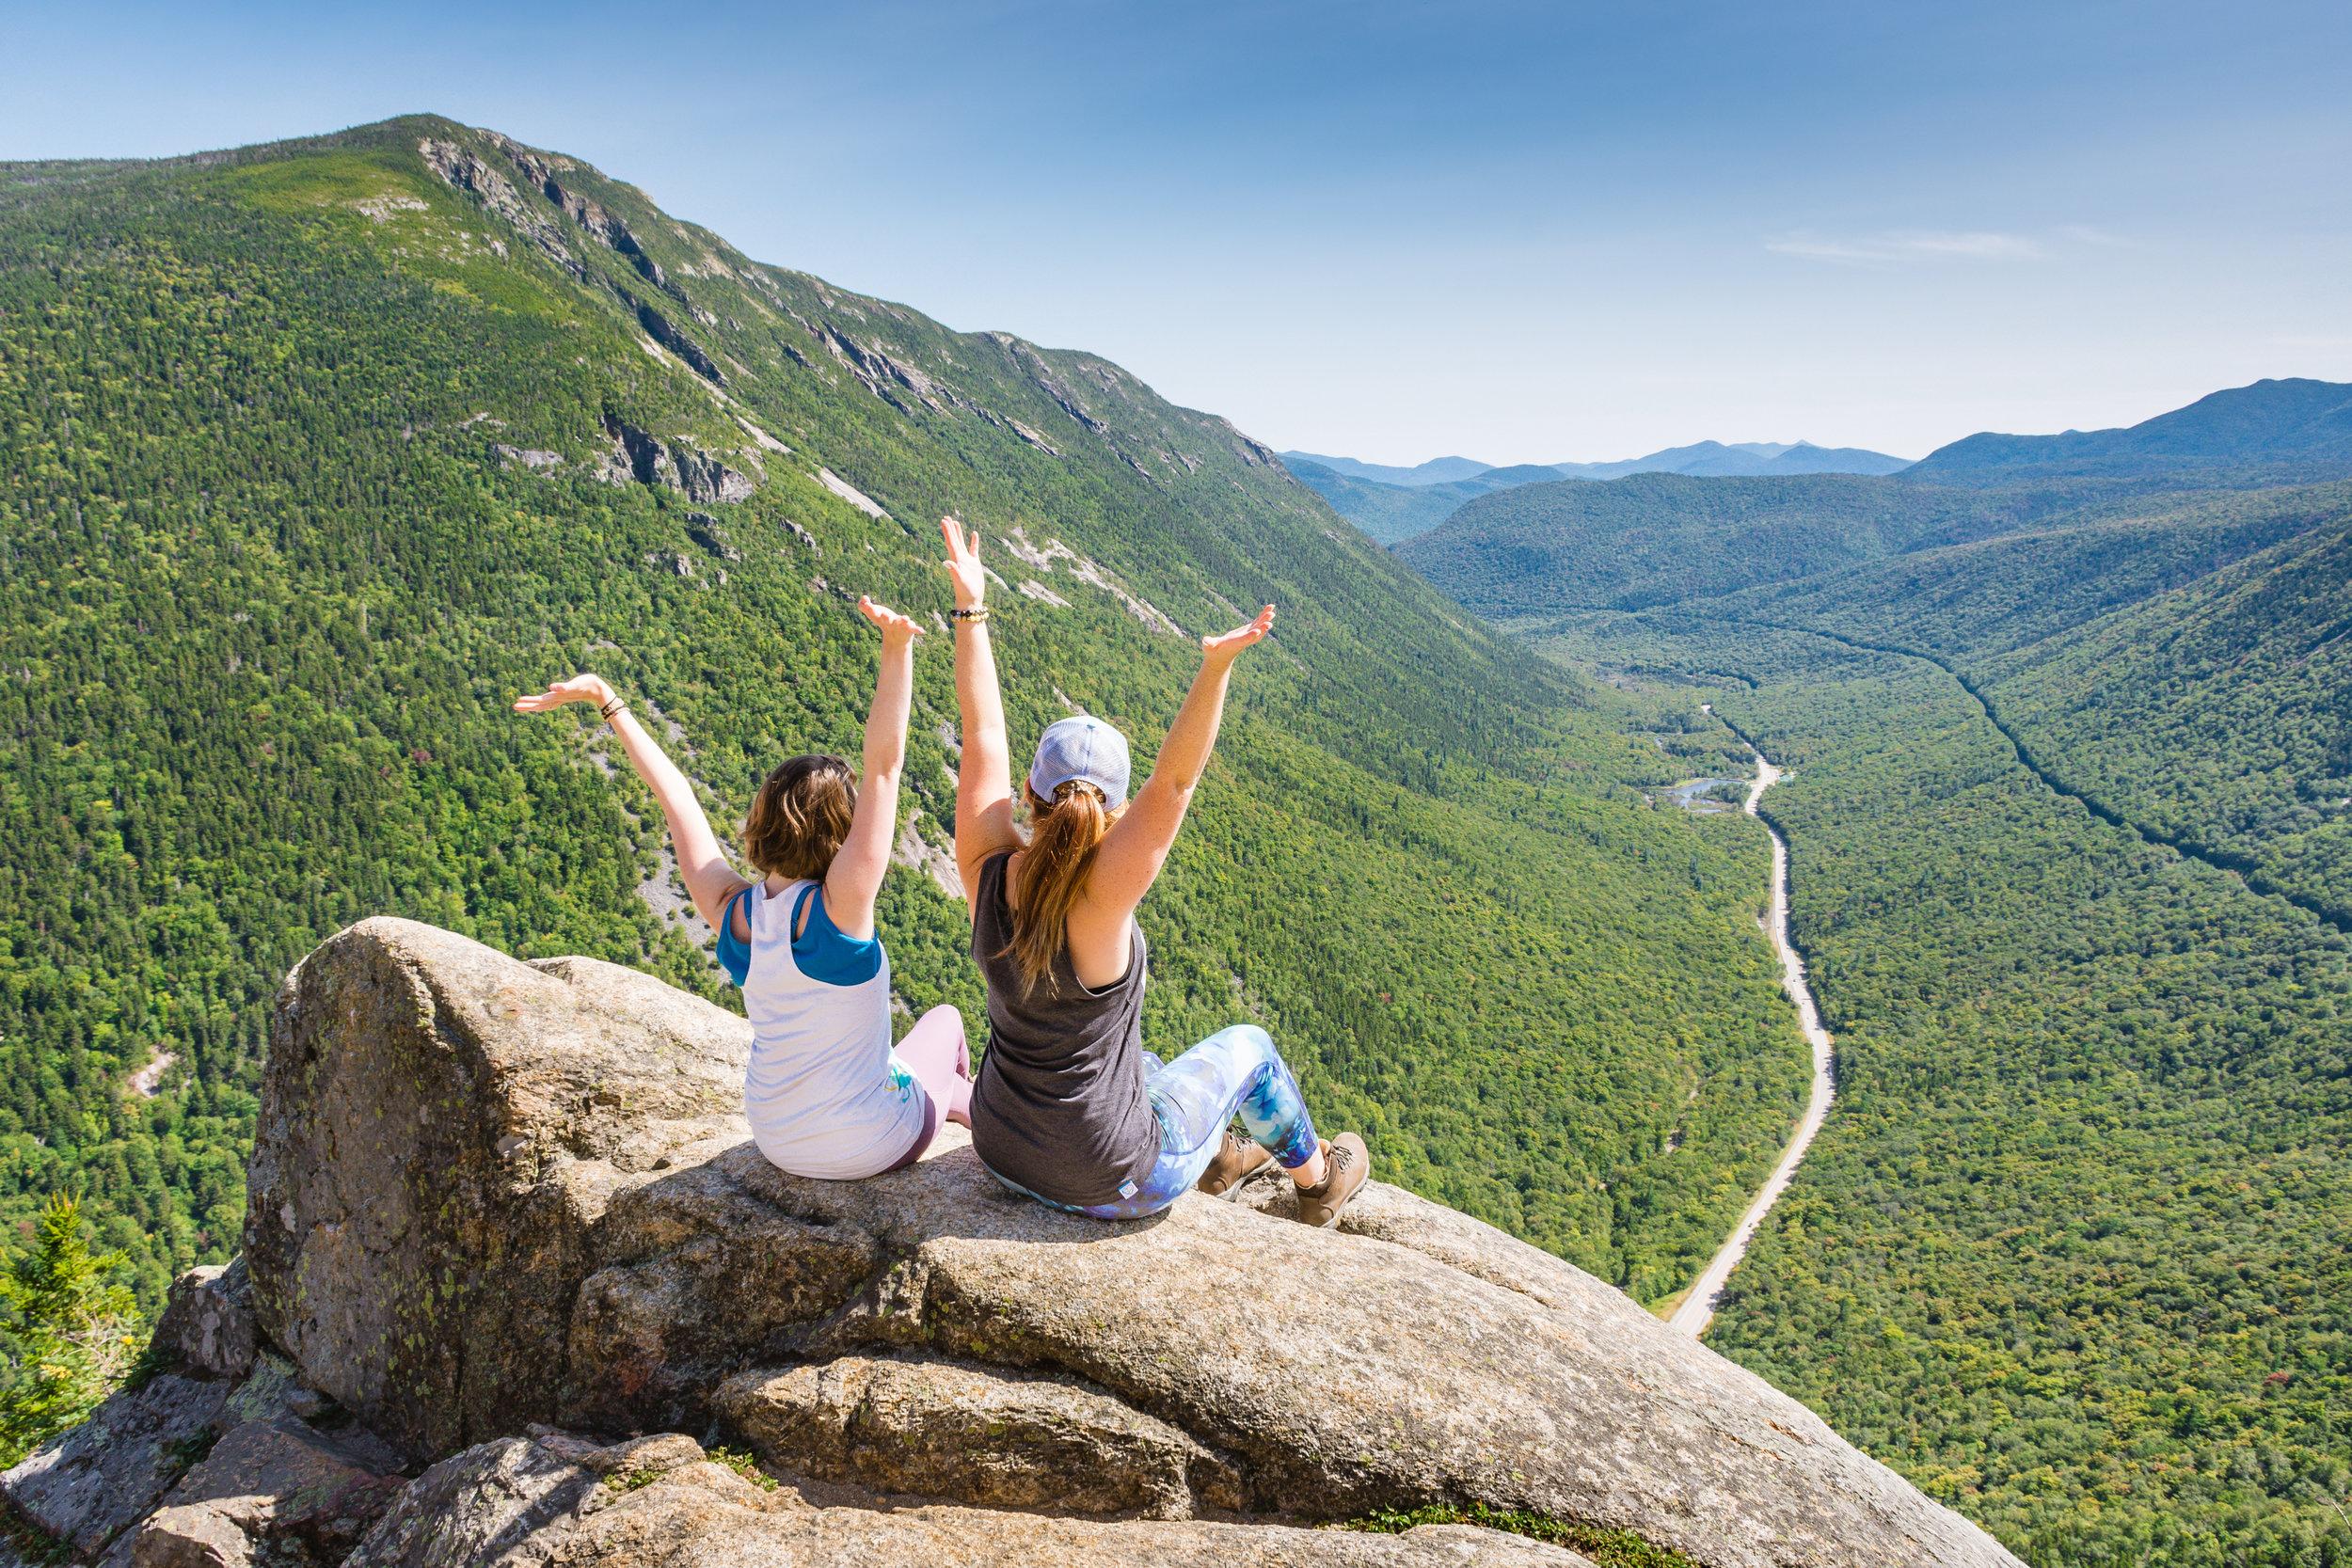 Mount-Willard-New-Hampshire.jpg